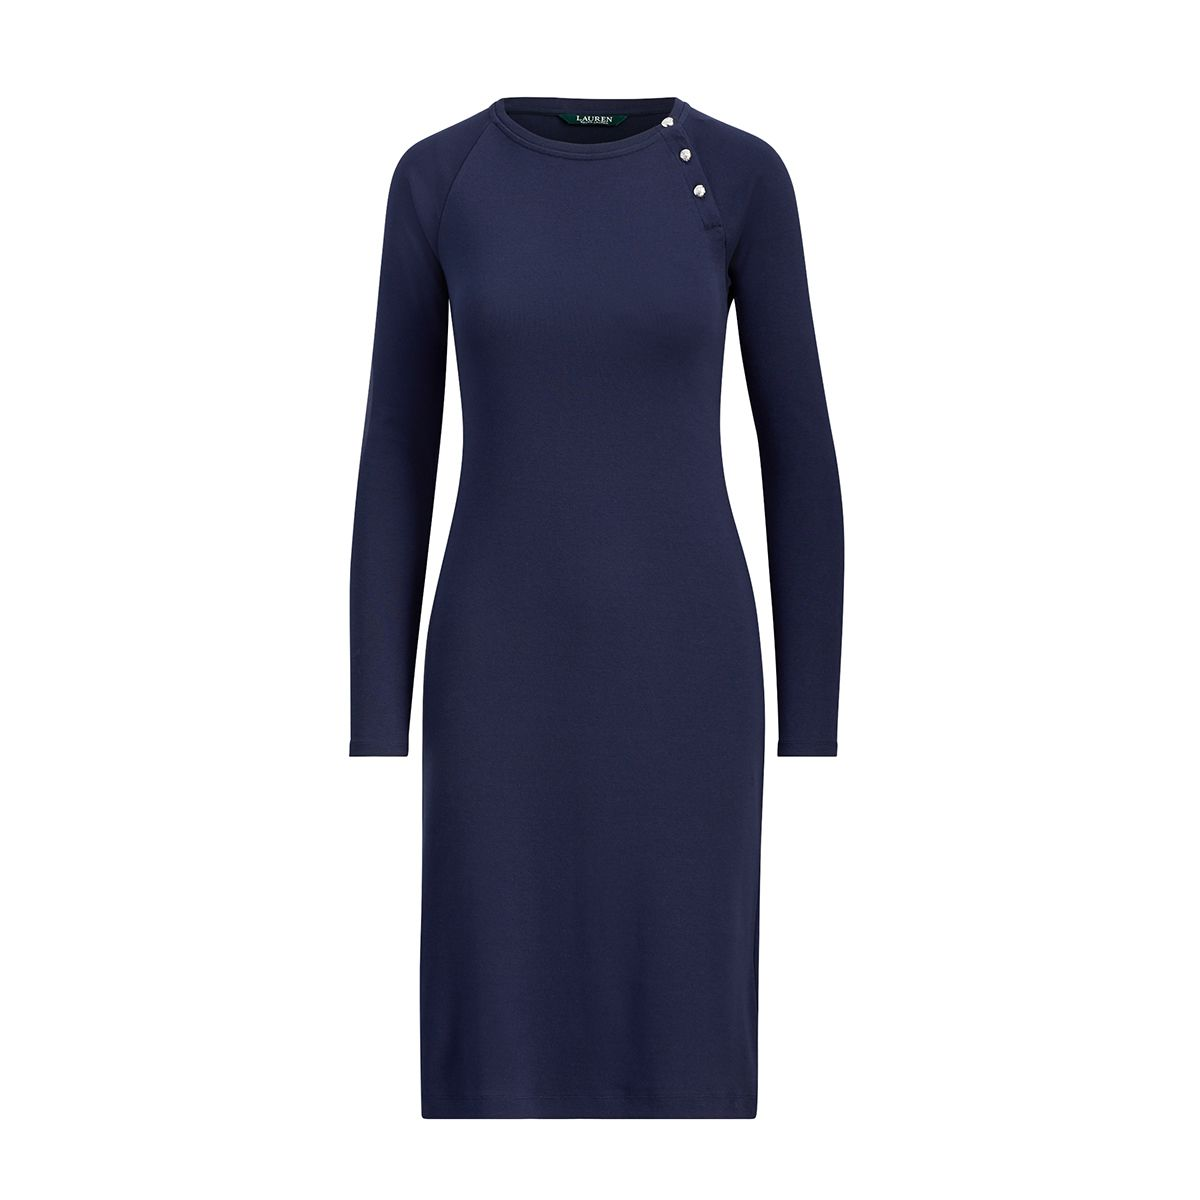 648d07d4521 Ralph Lauren Dresses - Macy s